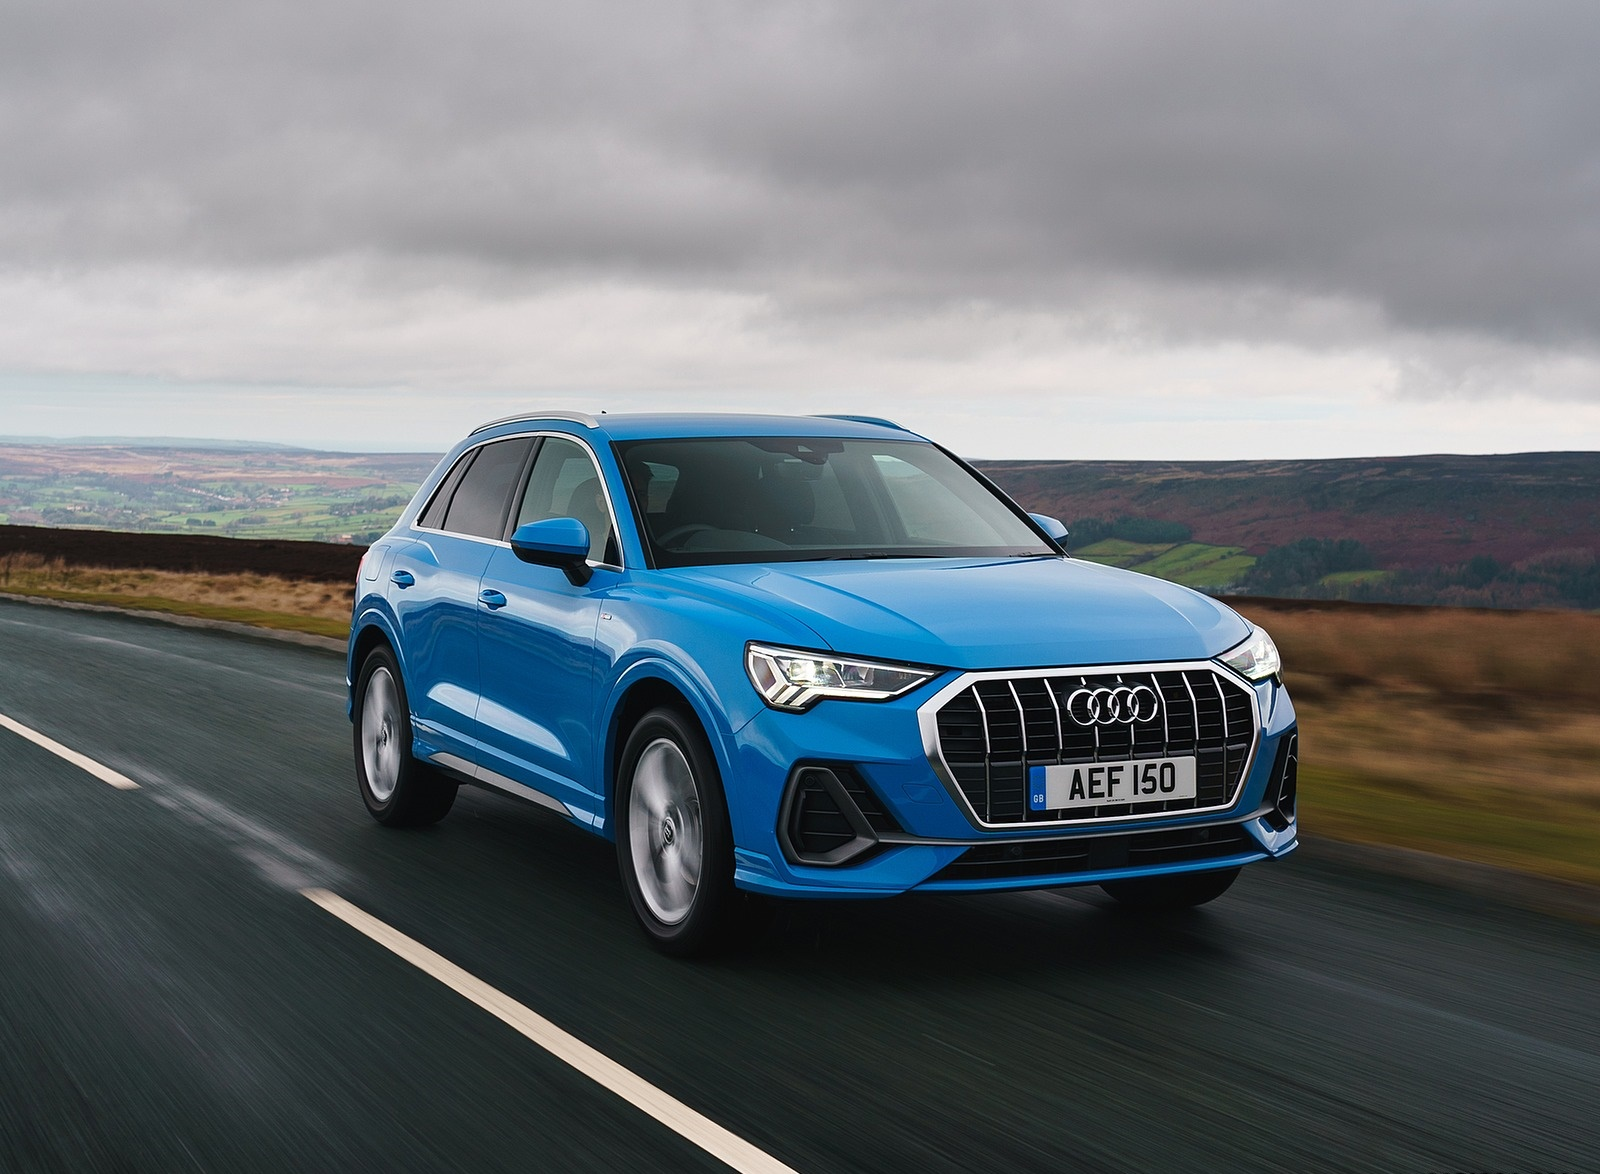 2019 Audi Q3 35 TFSI (UK-Spec) Front Three-Quarter Wallpaper (15)